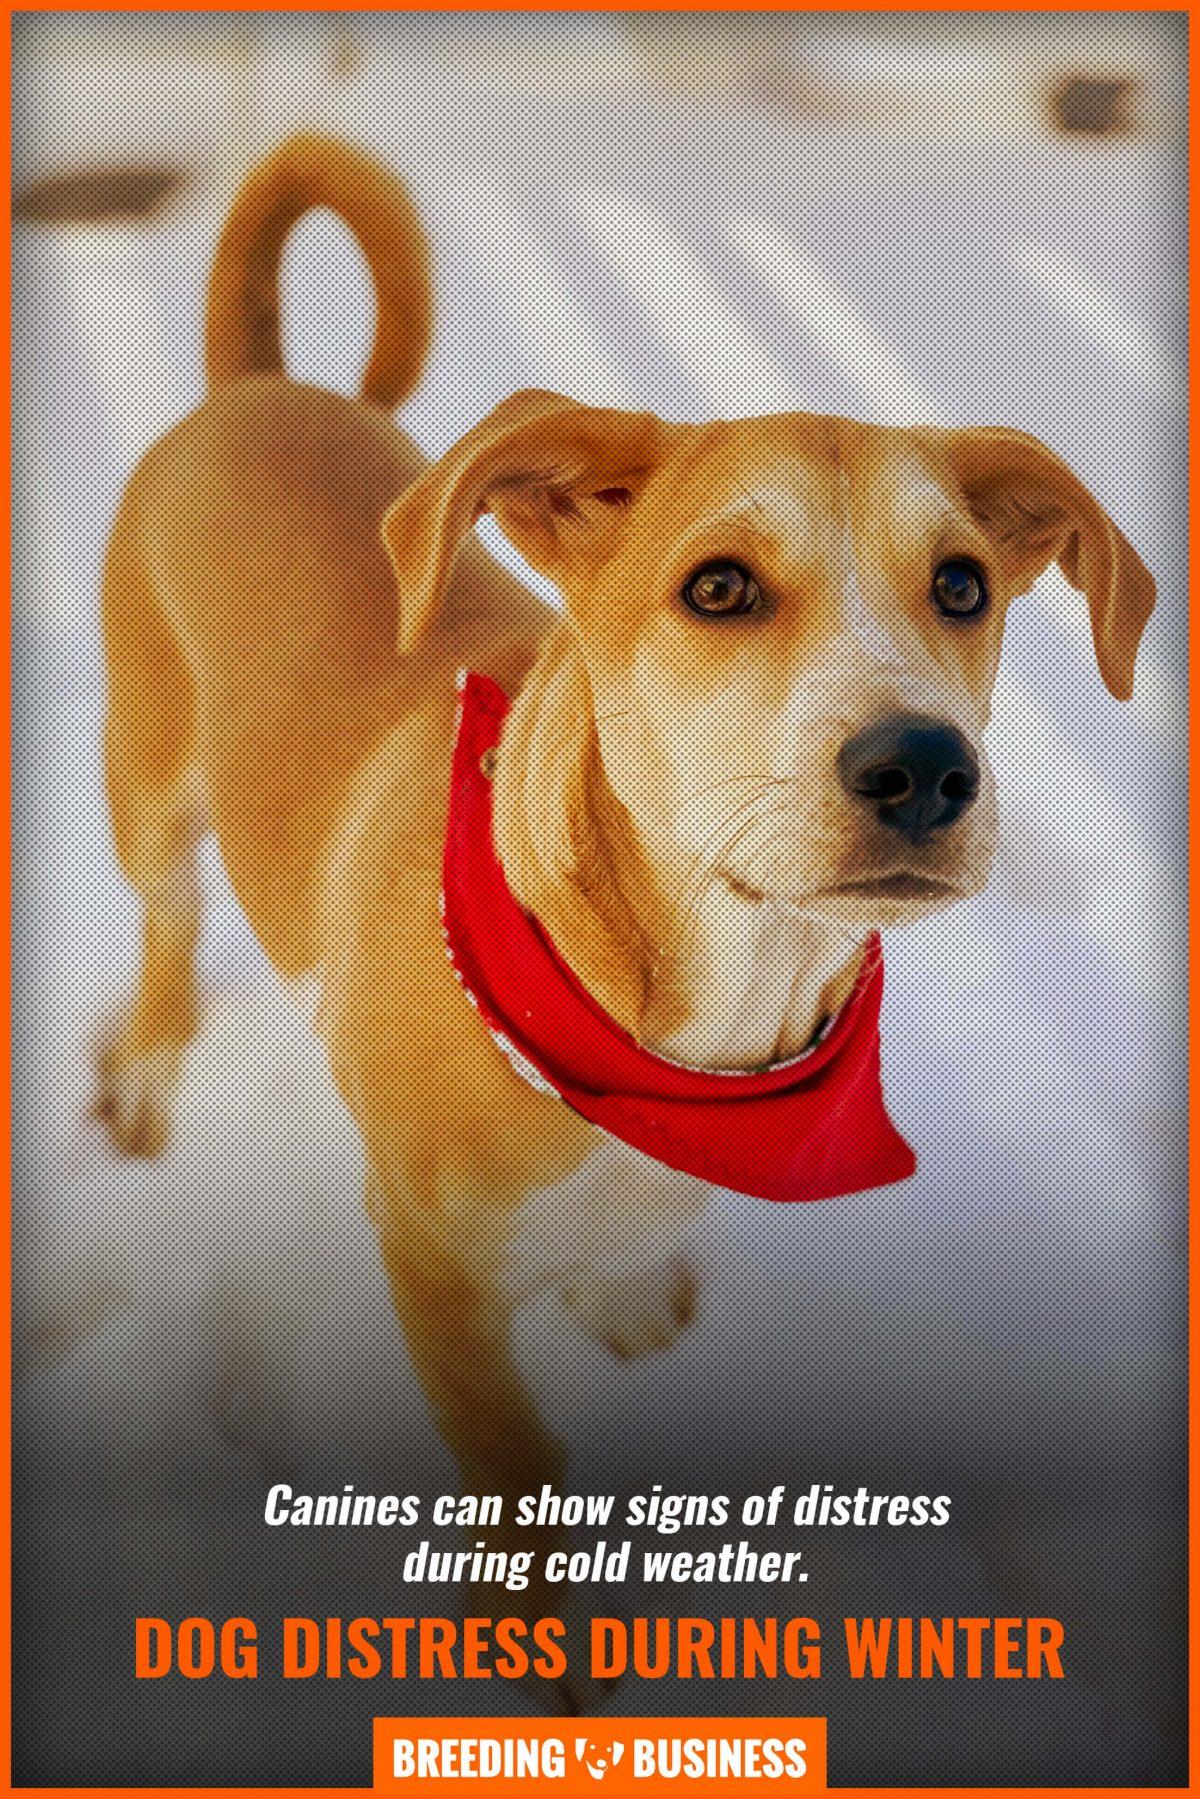 dog distress during winter